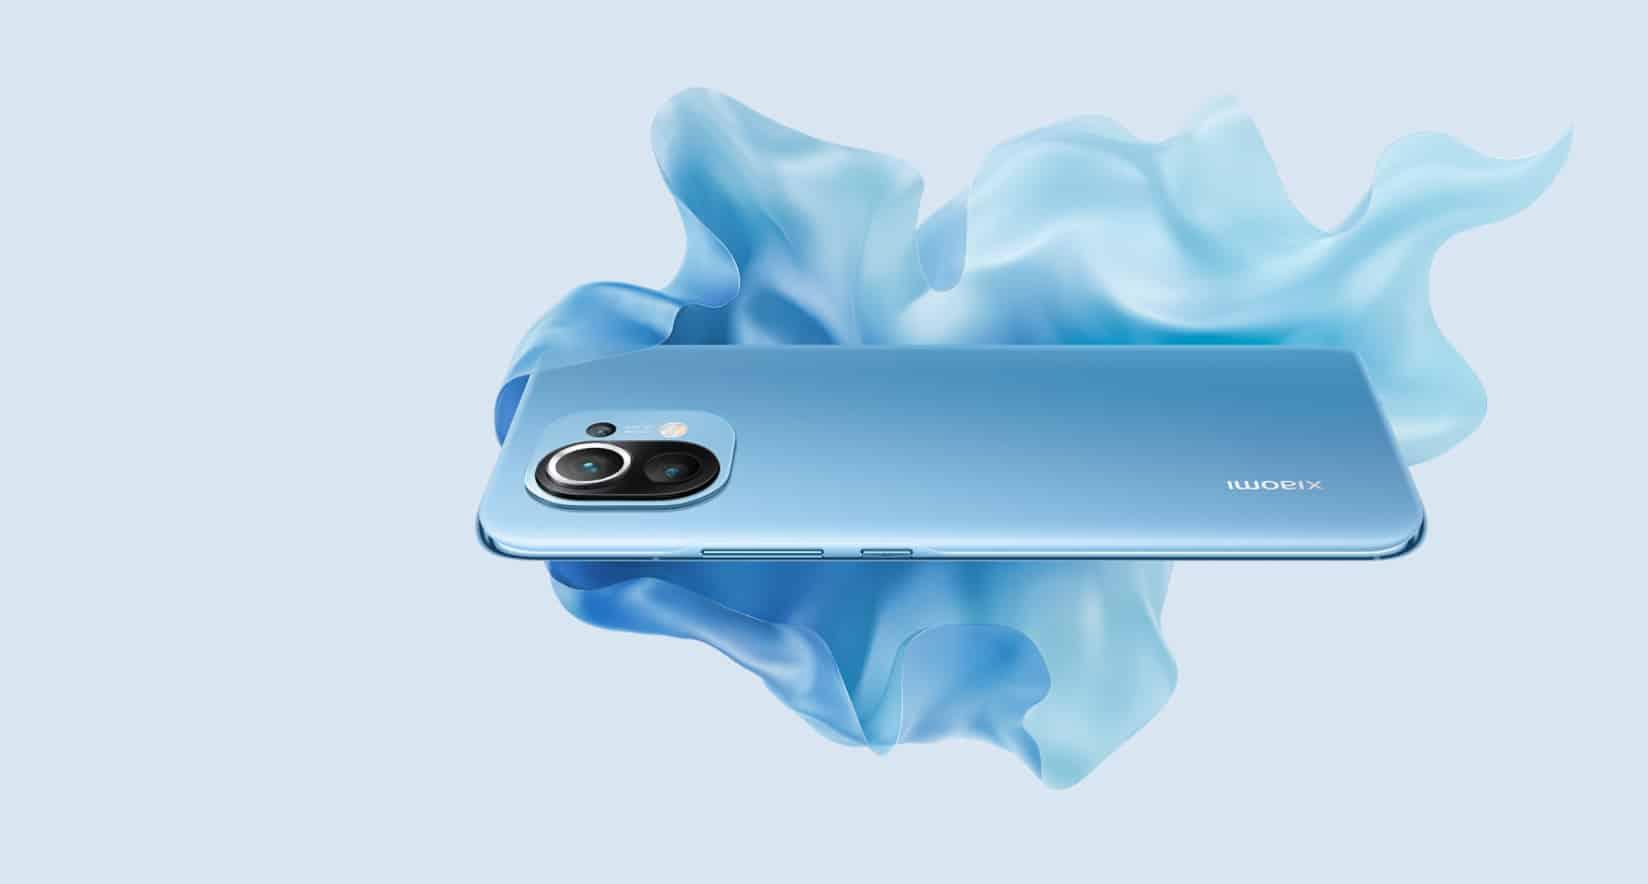 Xiaomi Mi 11 image 1